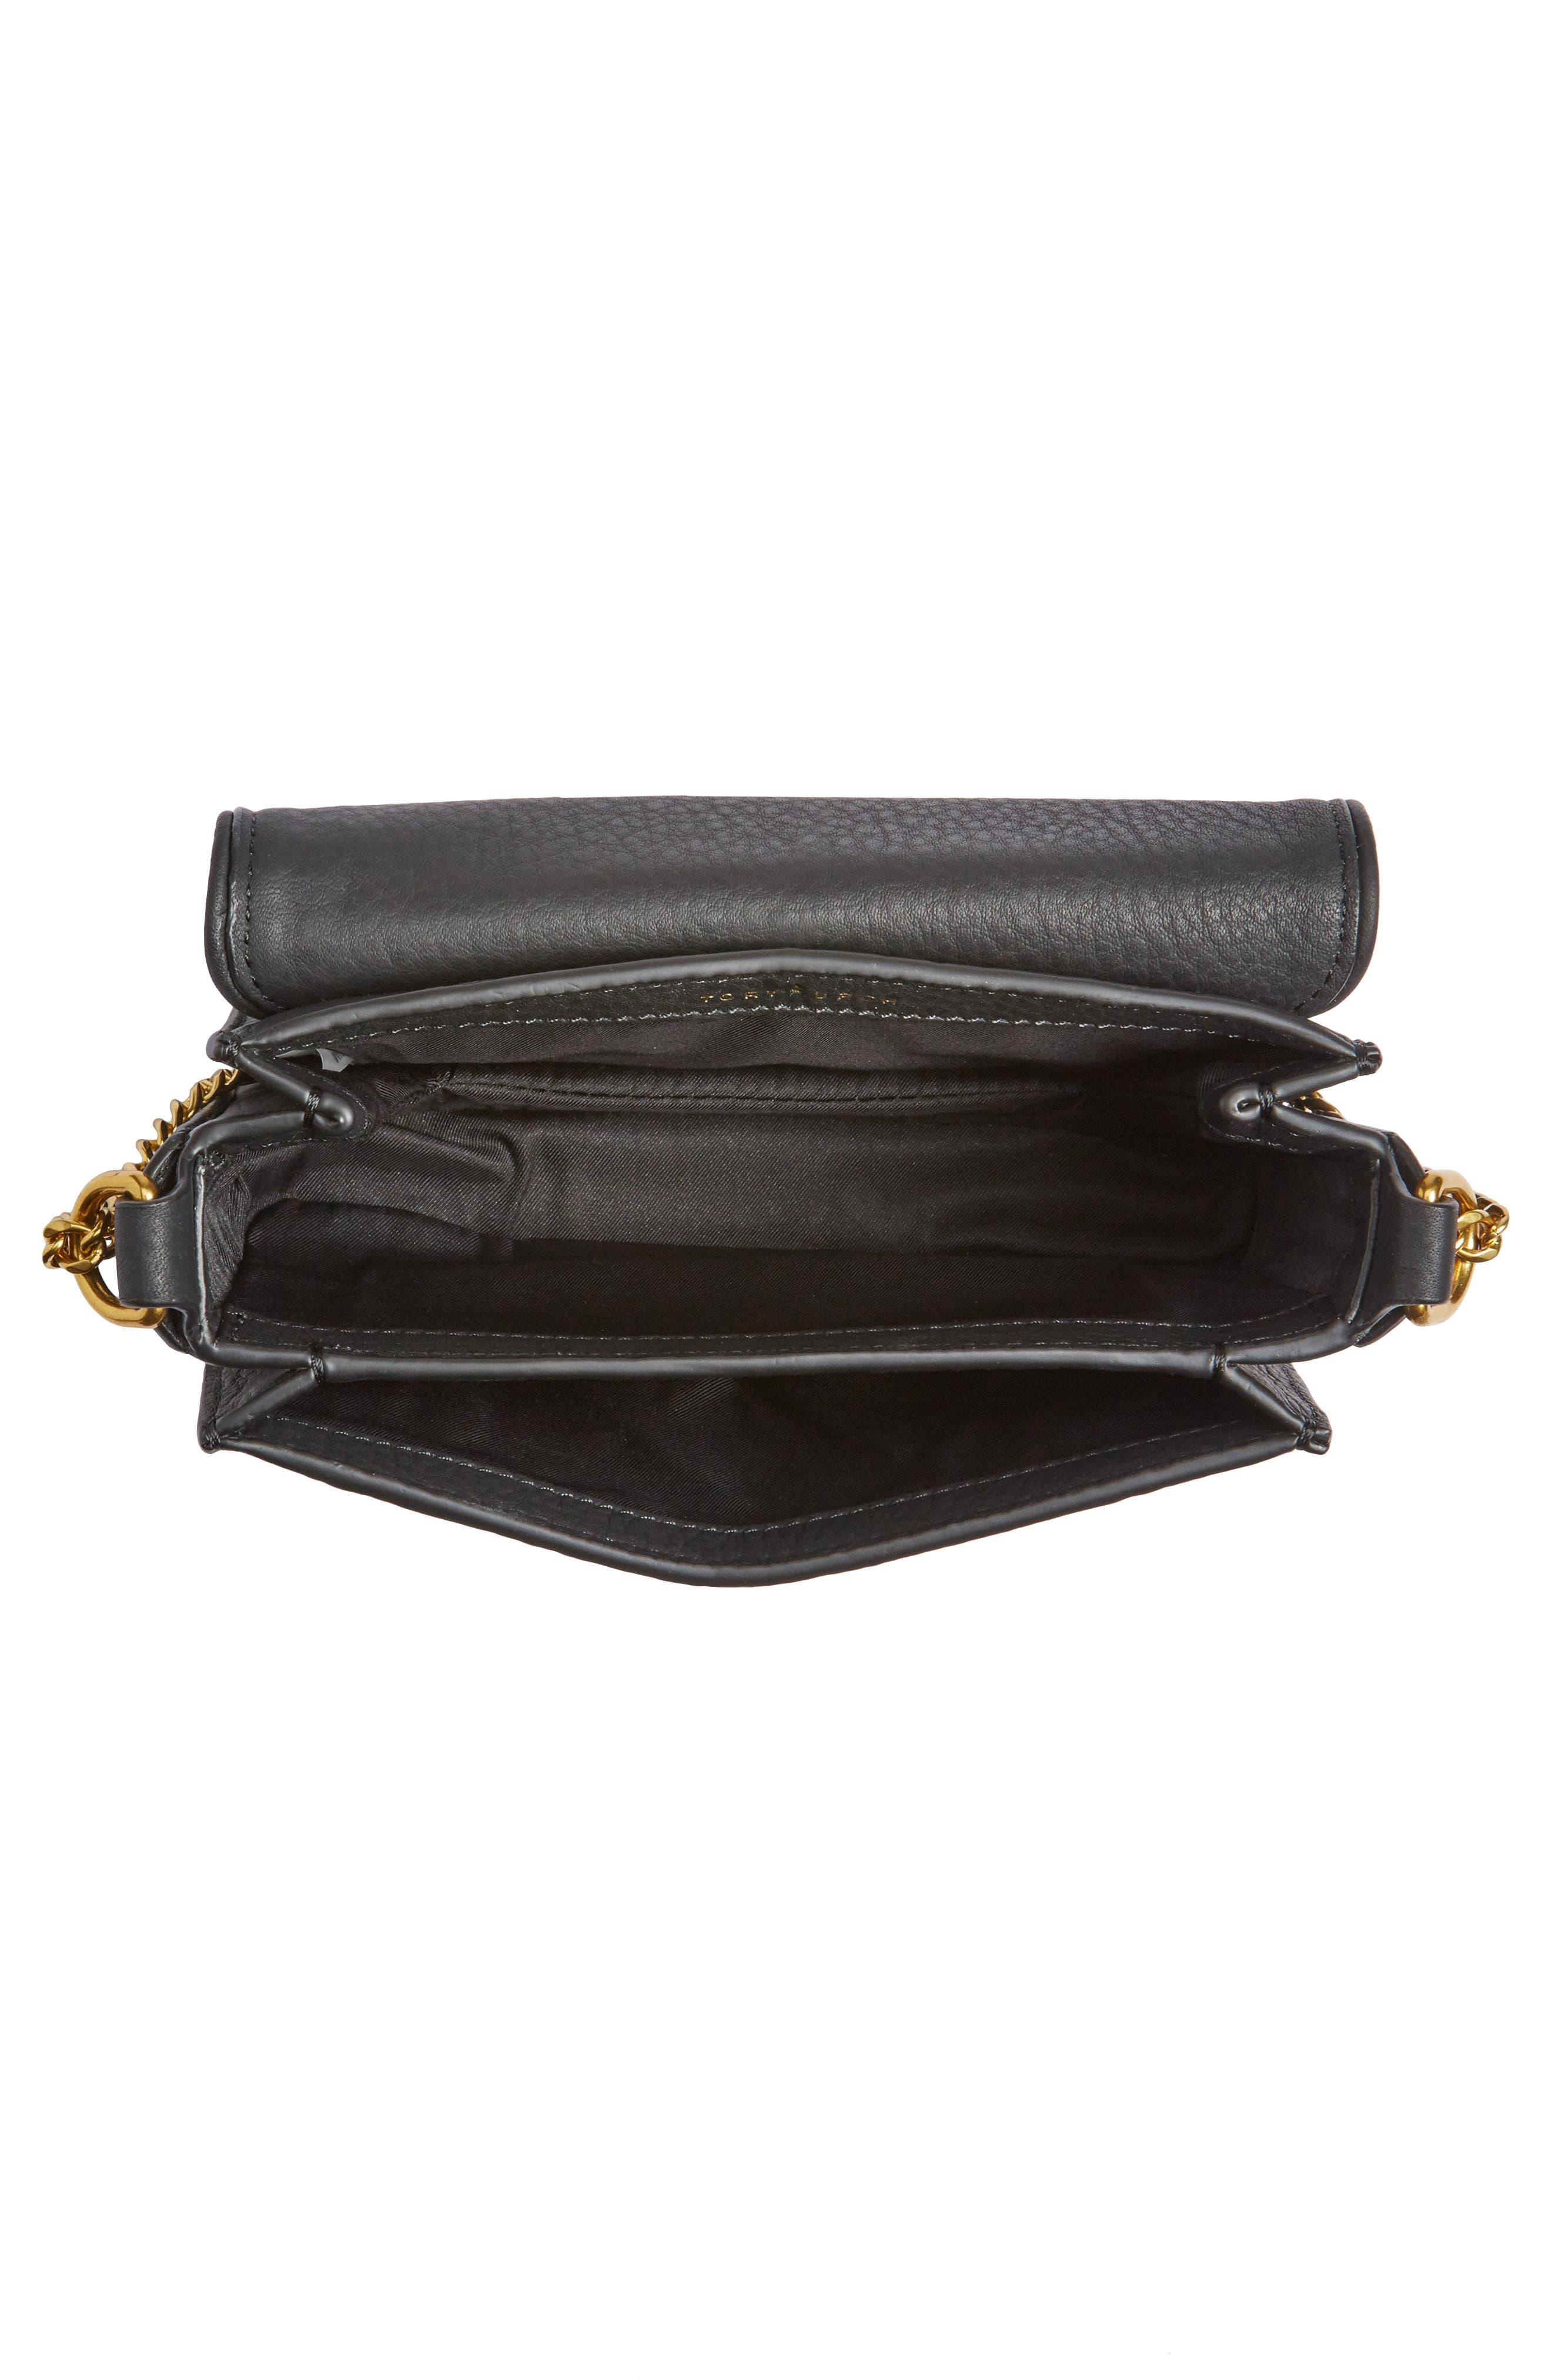 Mini Chelsea Leather Convertible Crossbody Bag,                             Alternate thumbnail 4, color,                             001